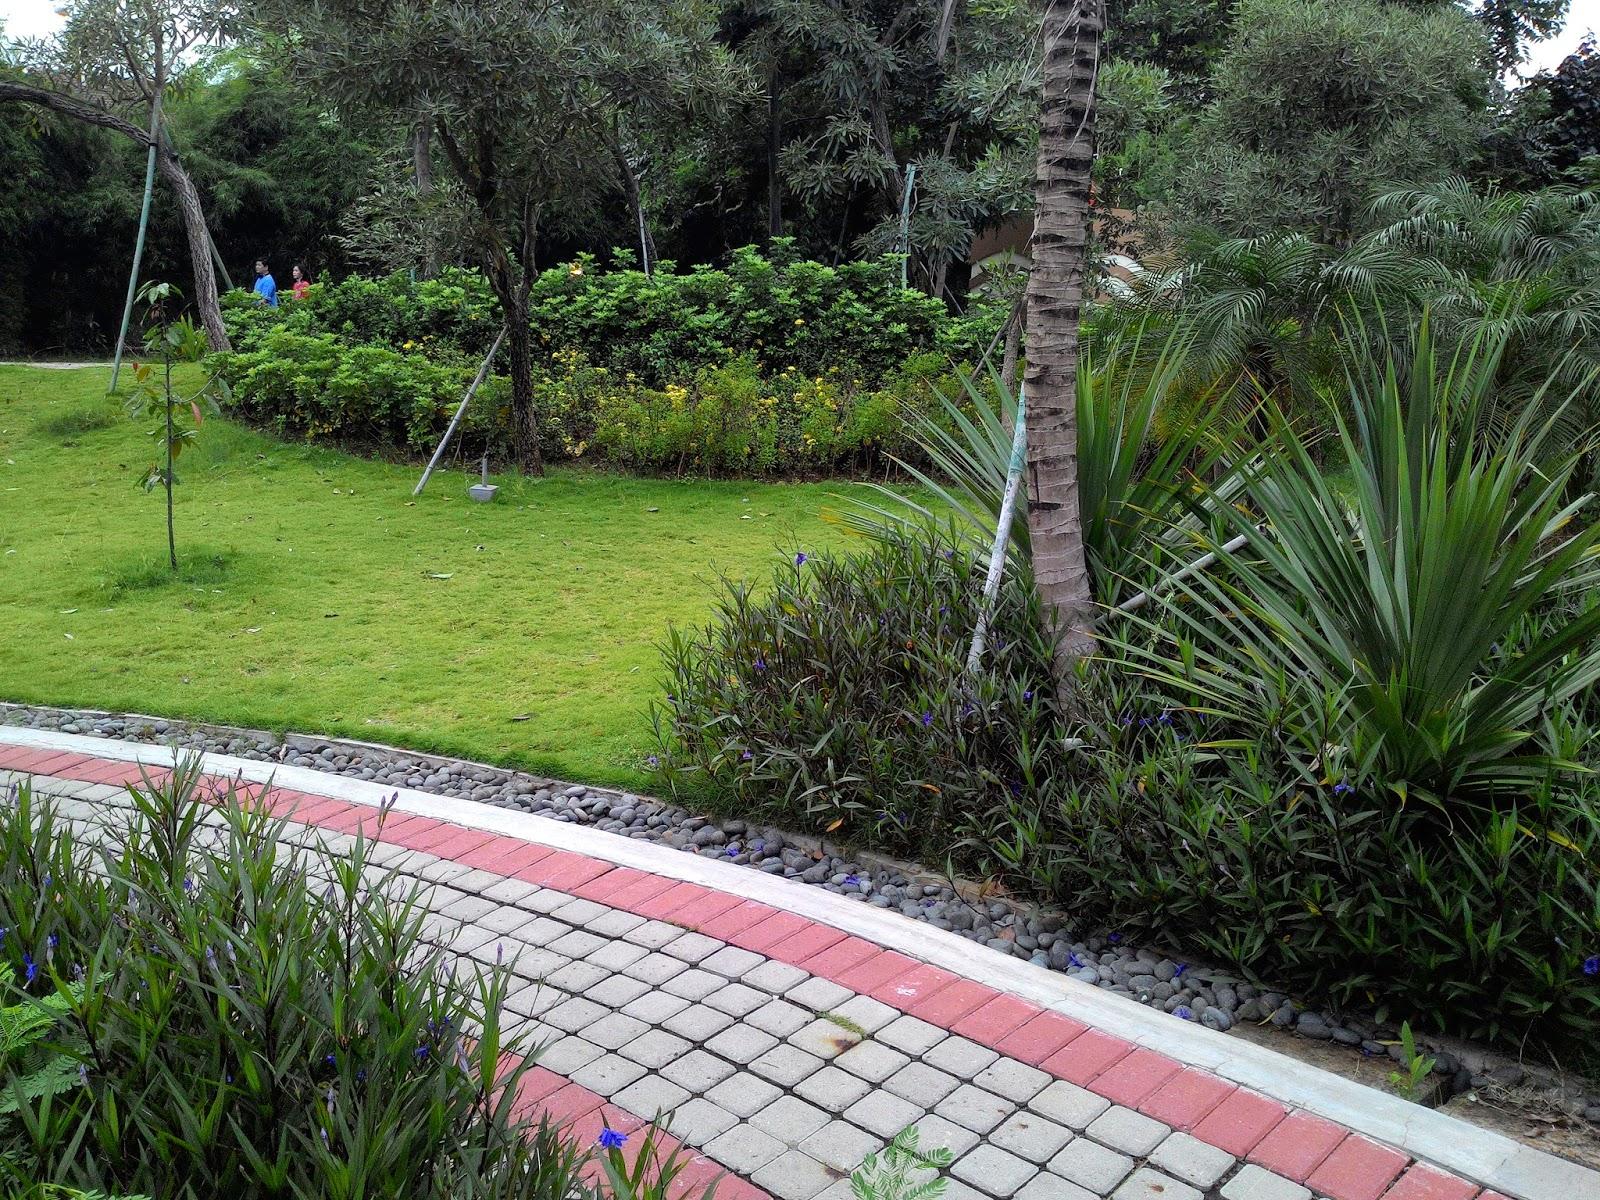 Backyard garden design inspired public park Backyard